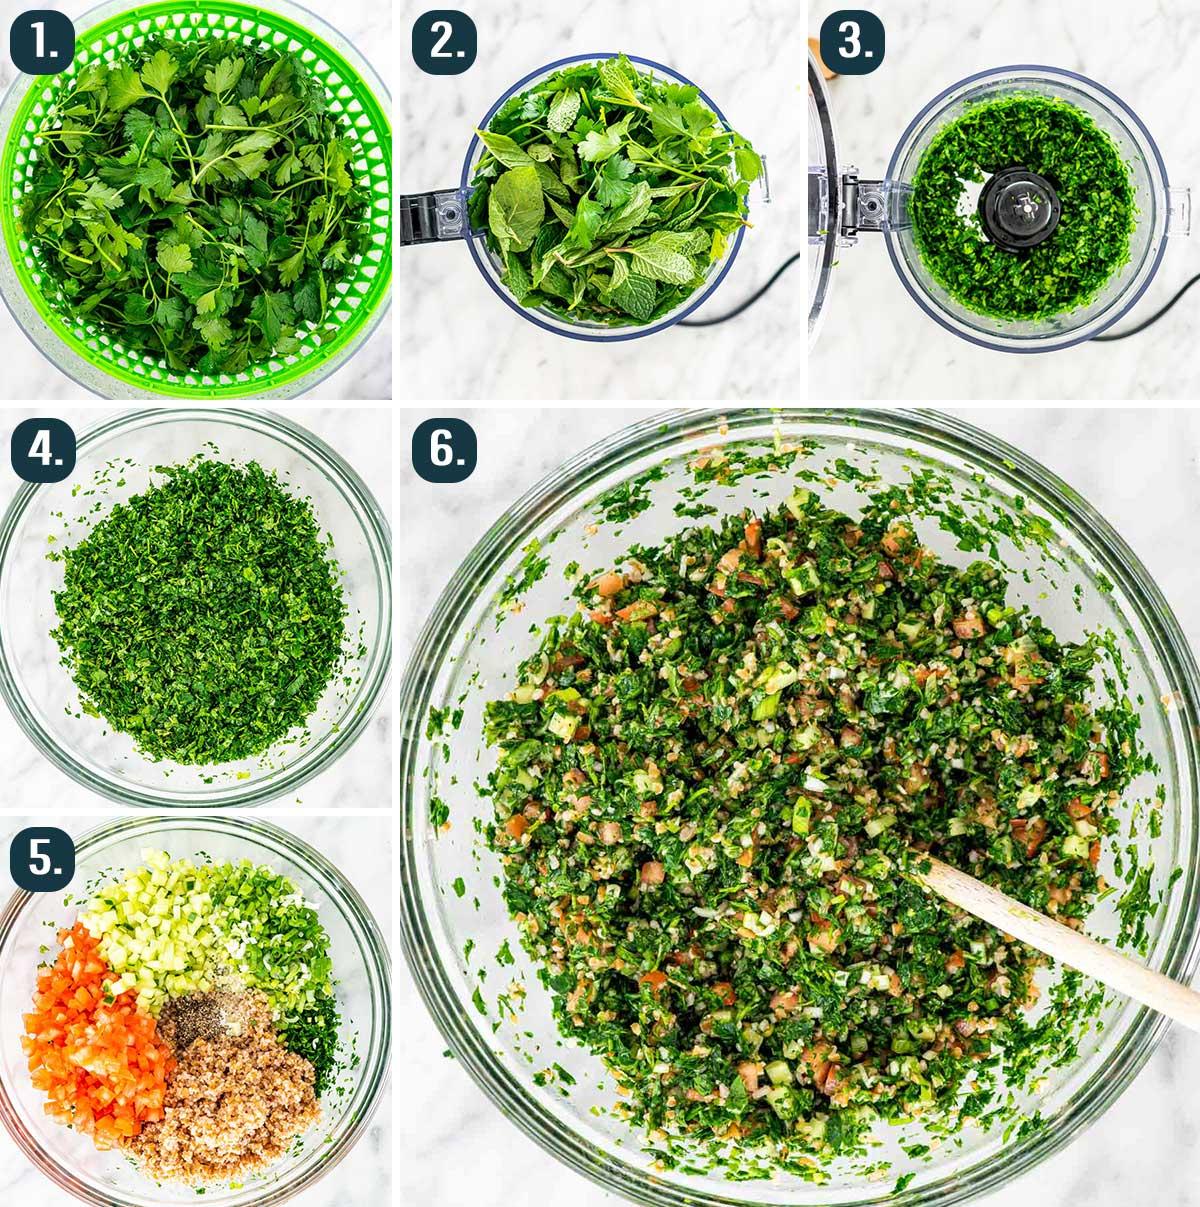 process shots showing how to make tabouli salad